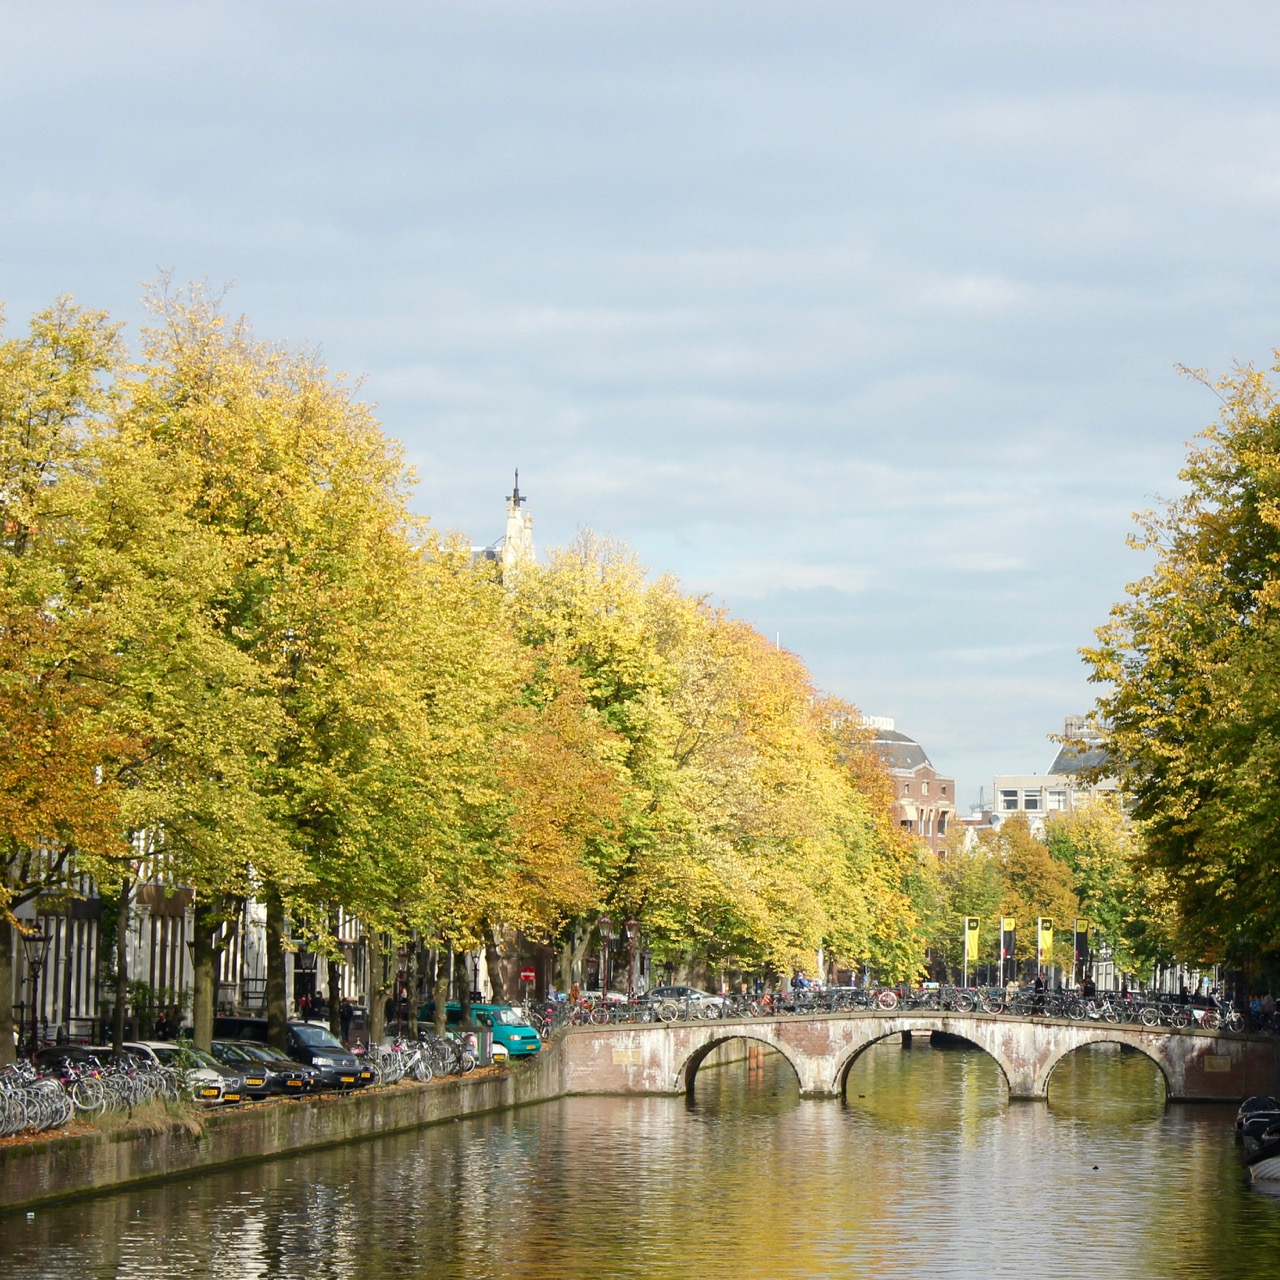 Amsterdam, Netherlands - 5